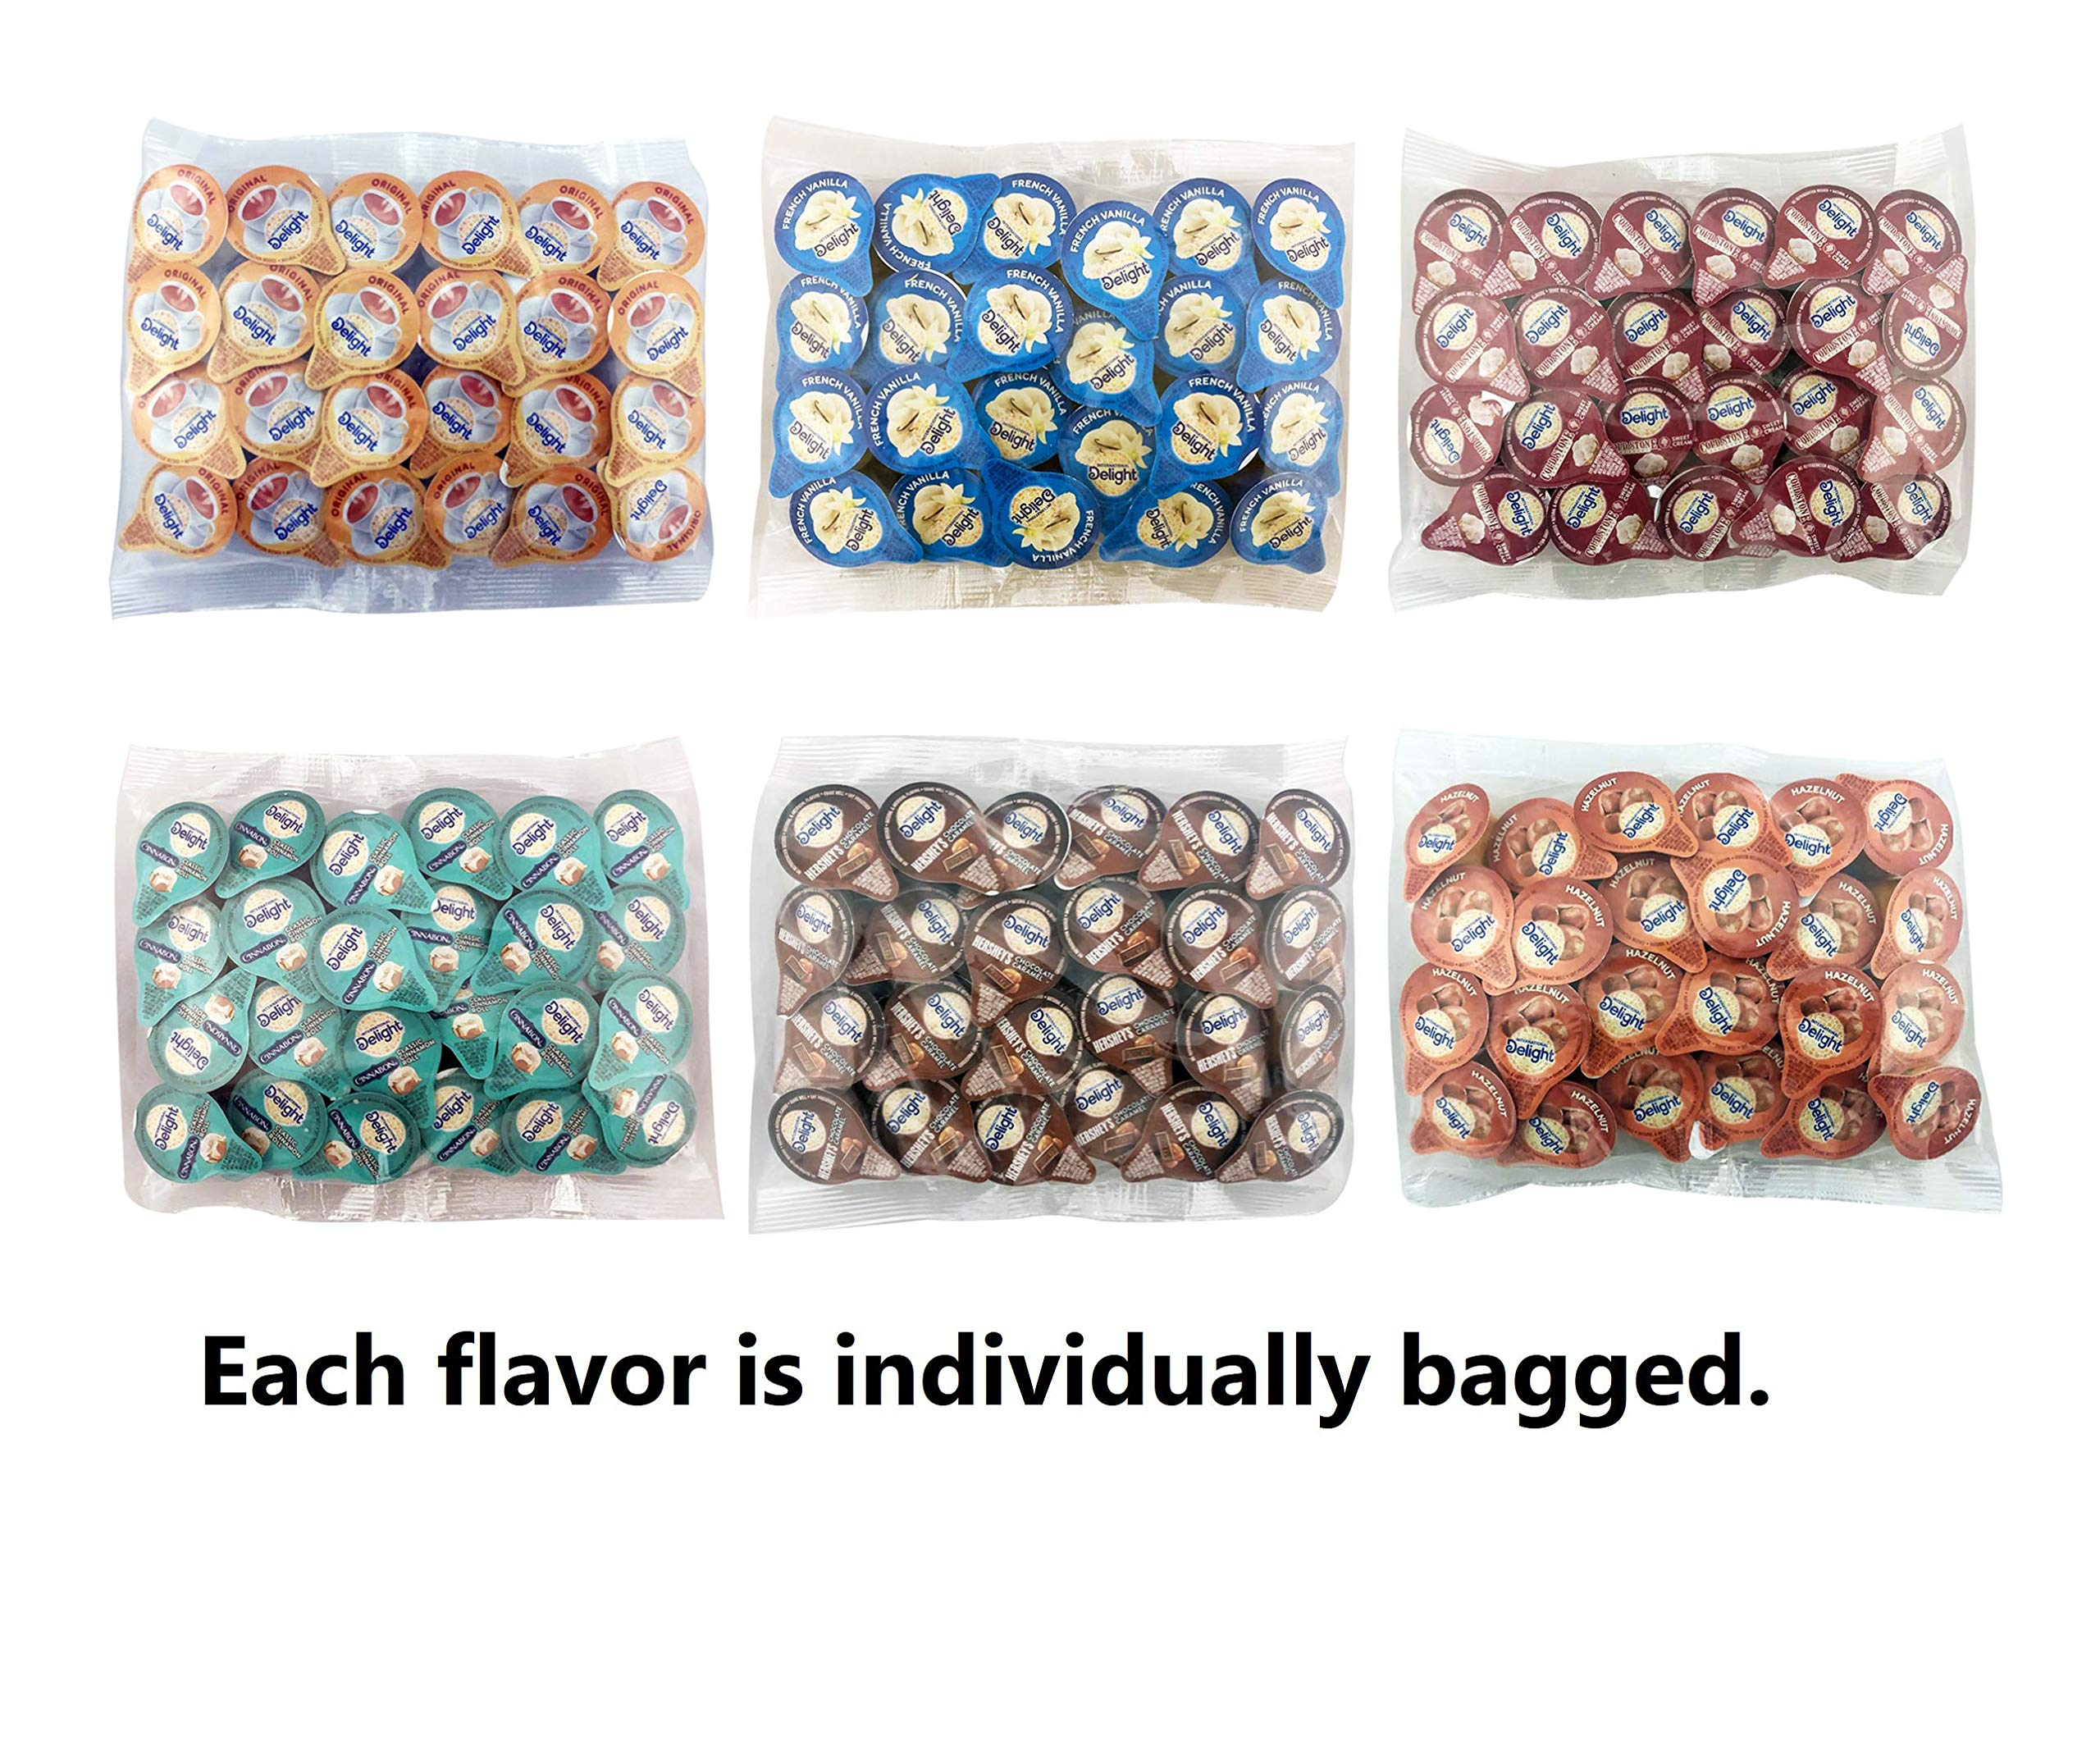 International Delight Non-Dairy Liquid Creamer Singles - 6 Flavor Assortment (144 Pack)NEW Custom Leak Resistant Packaging